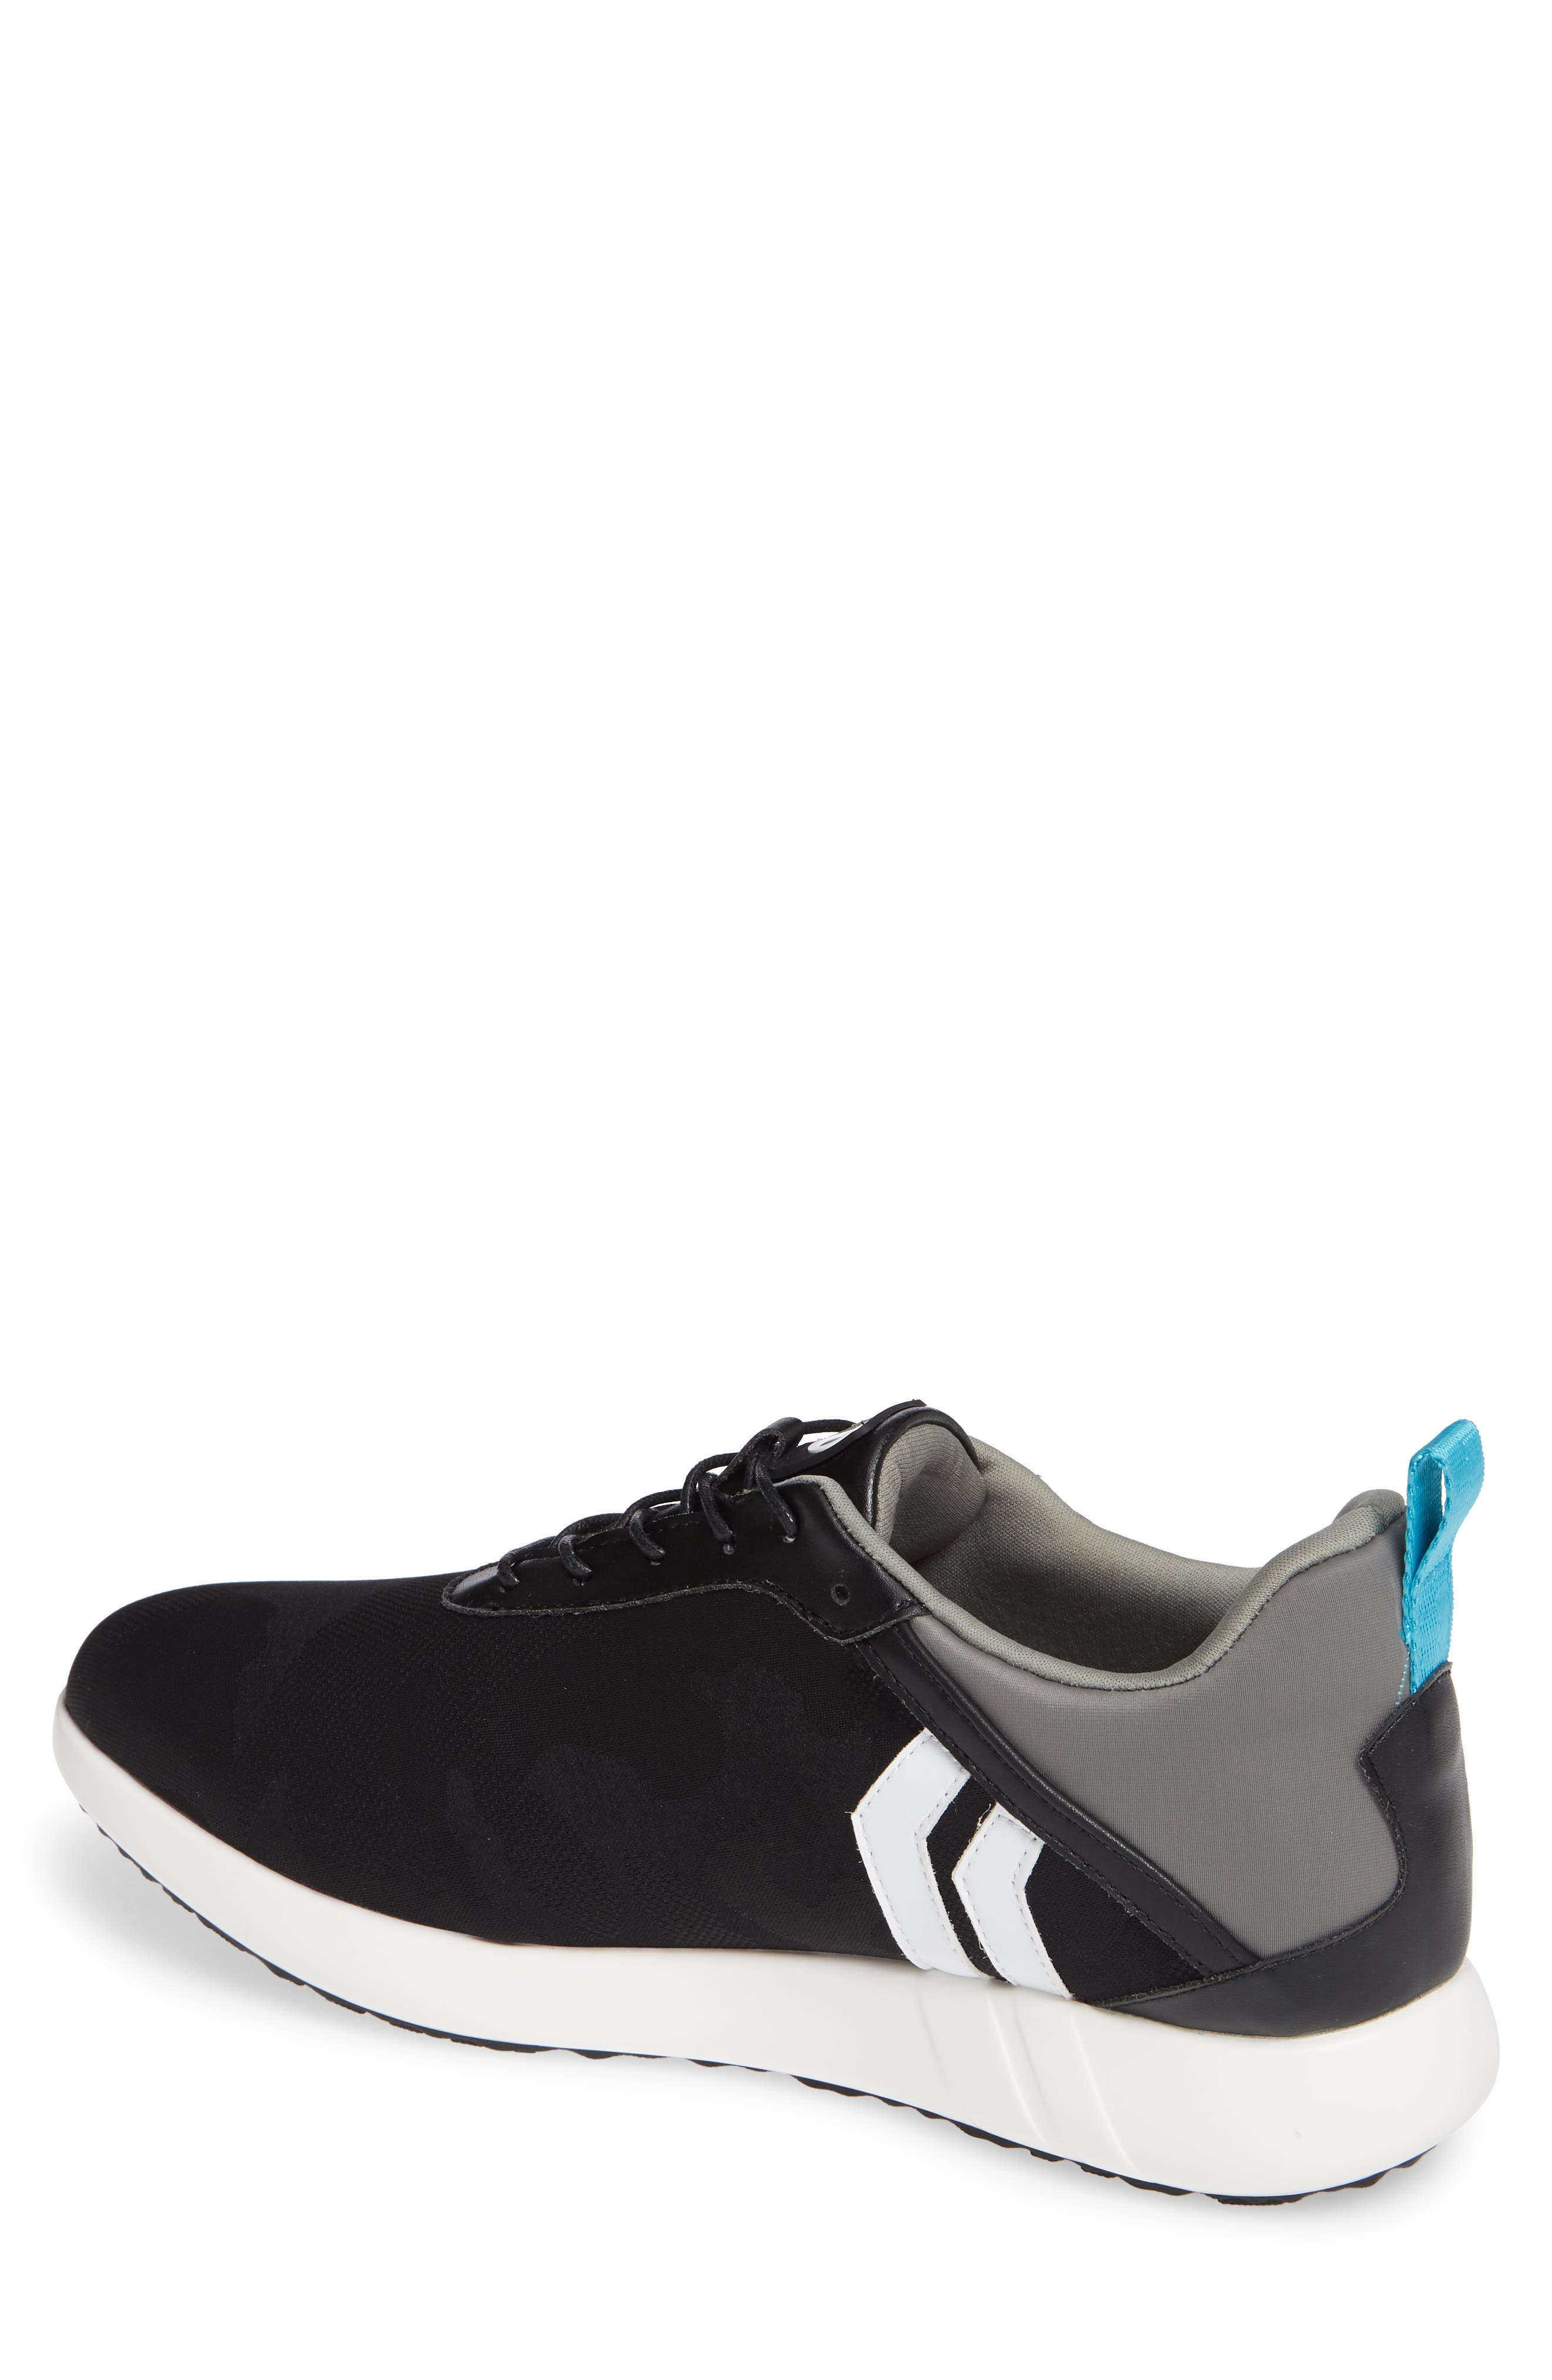 Camo Sneaker,                             Alternate thumbnail 2, color,                             001